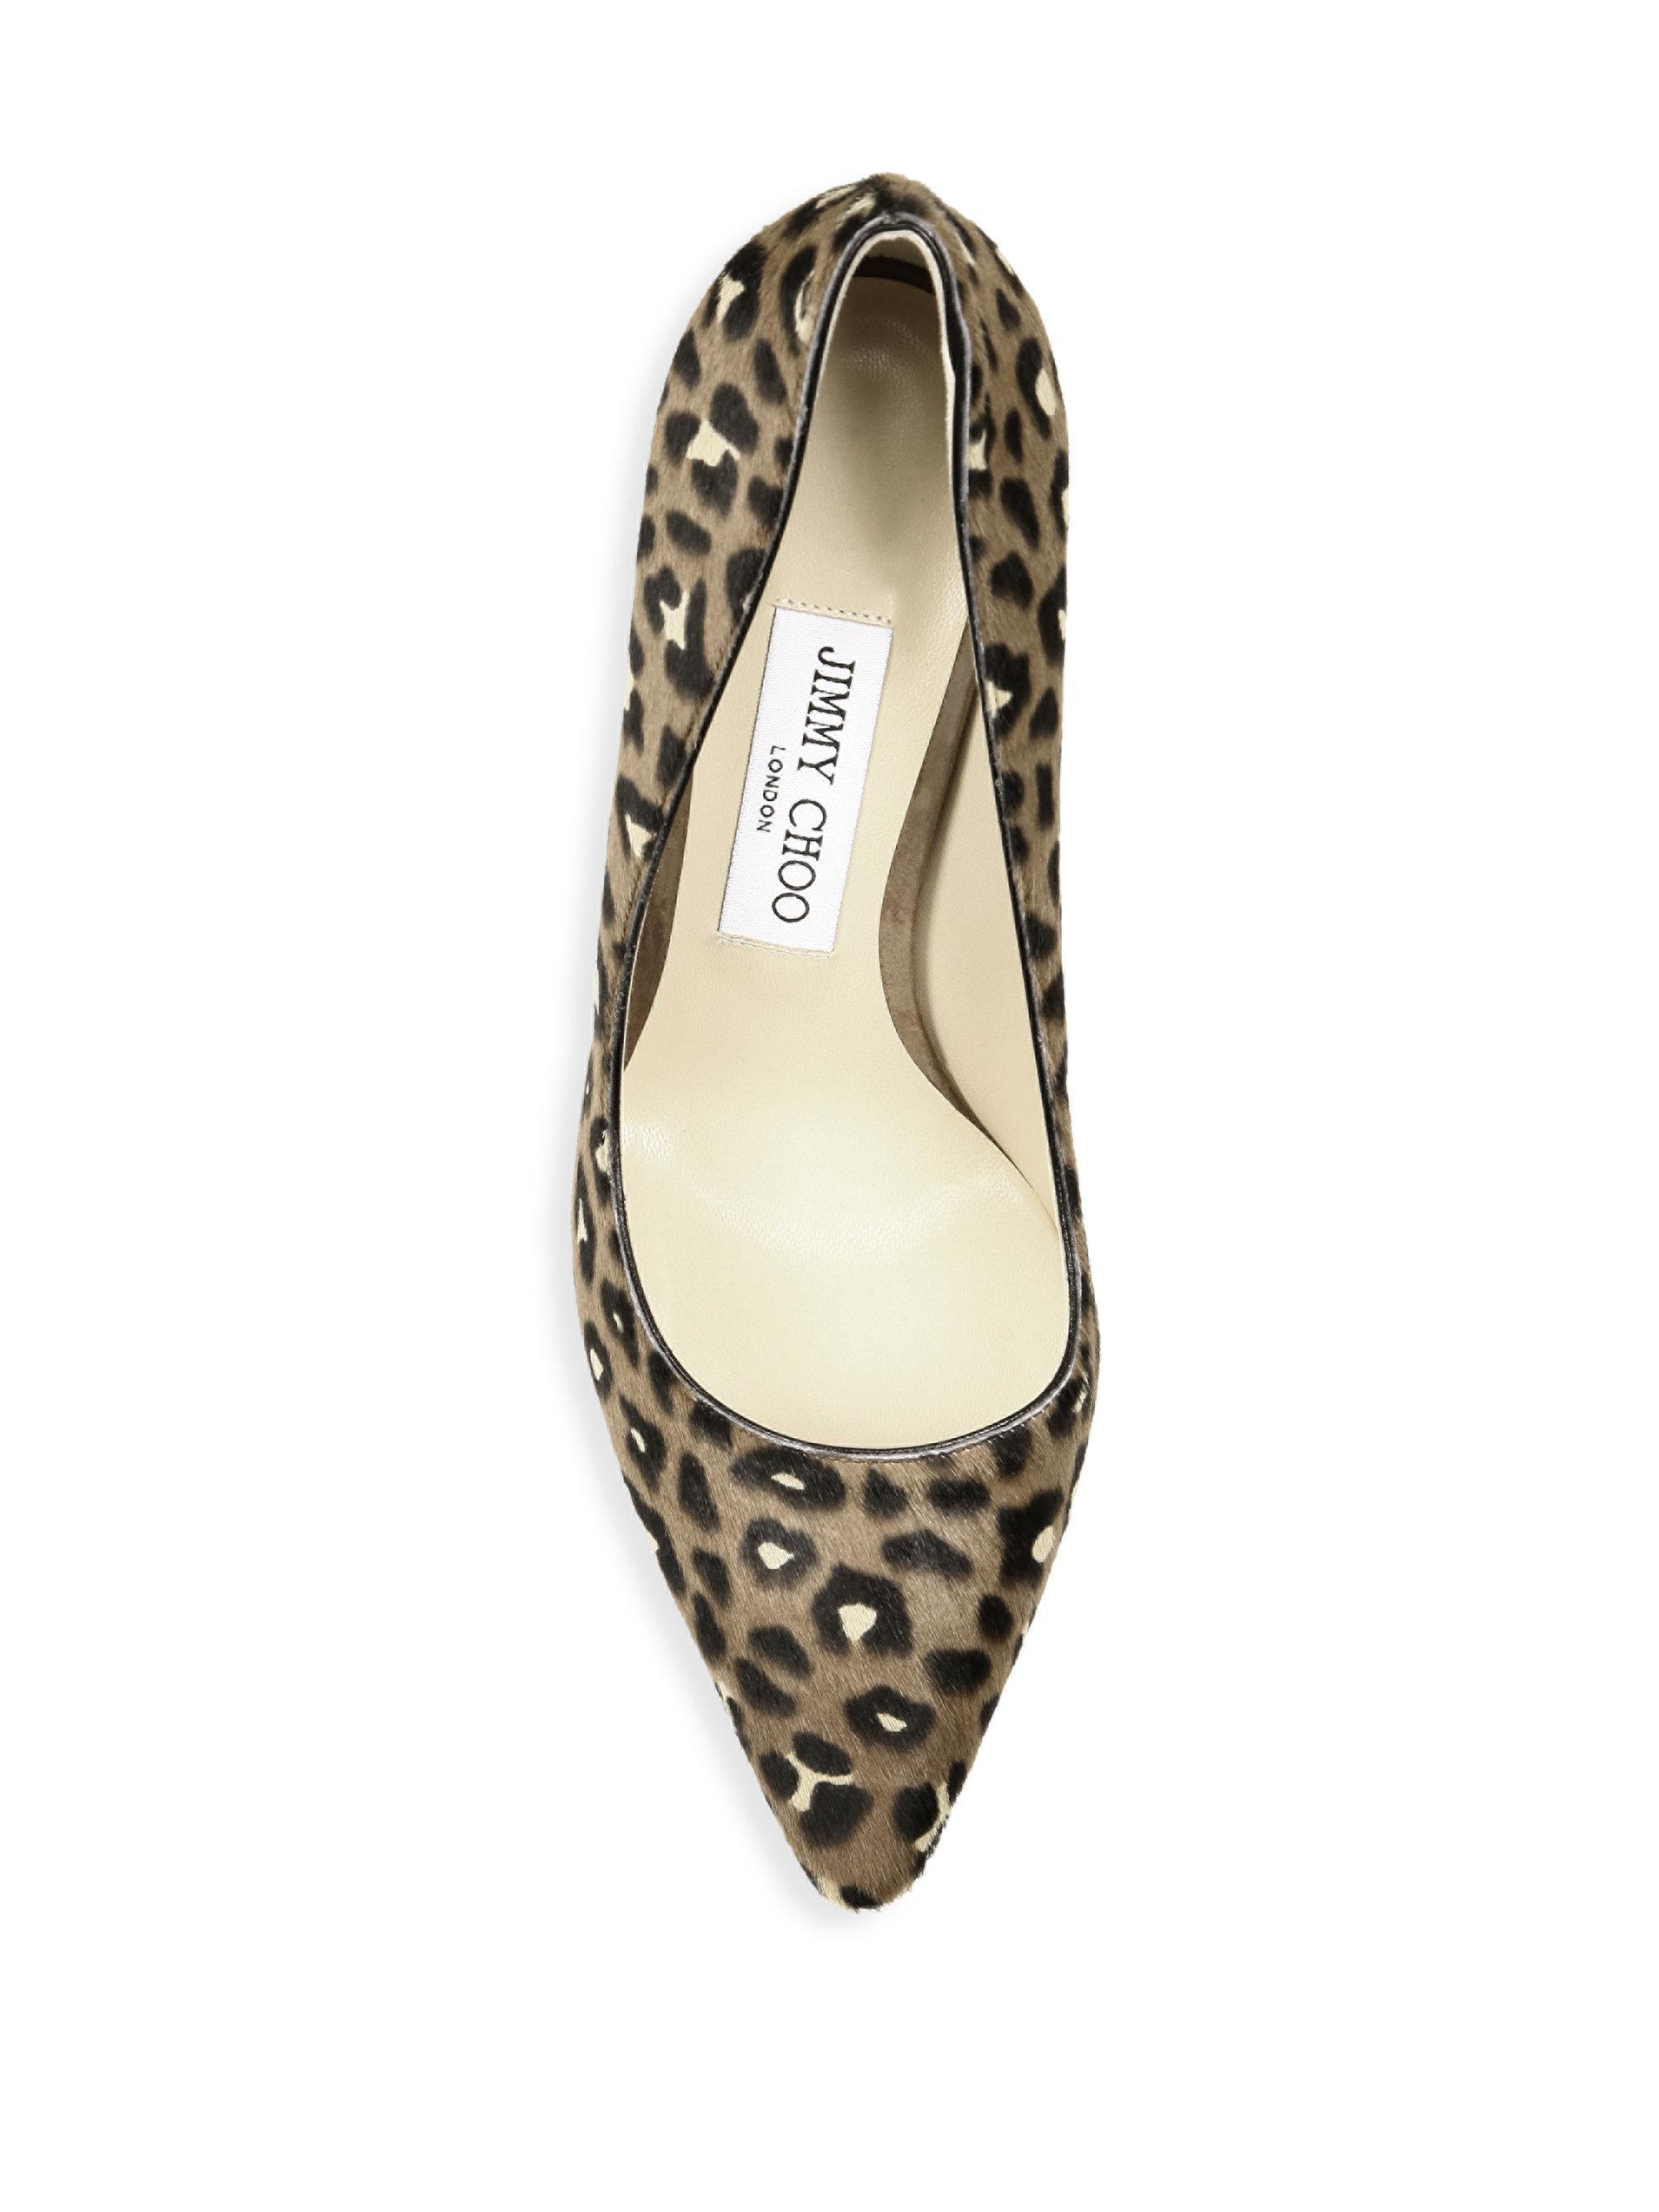 ce77c0b2704a Jimmy Choo Romy 100 Leopard-print Calf Hair Pumps - Lyst